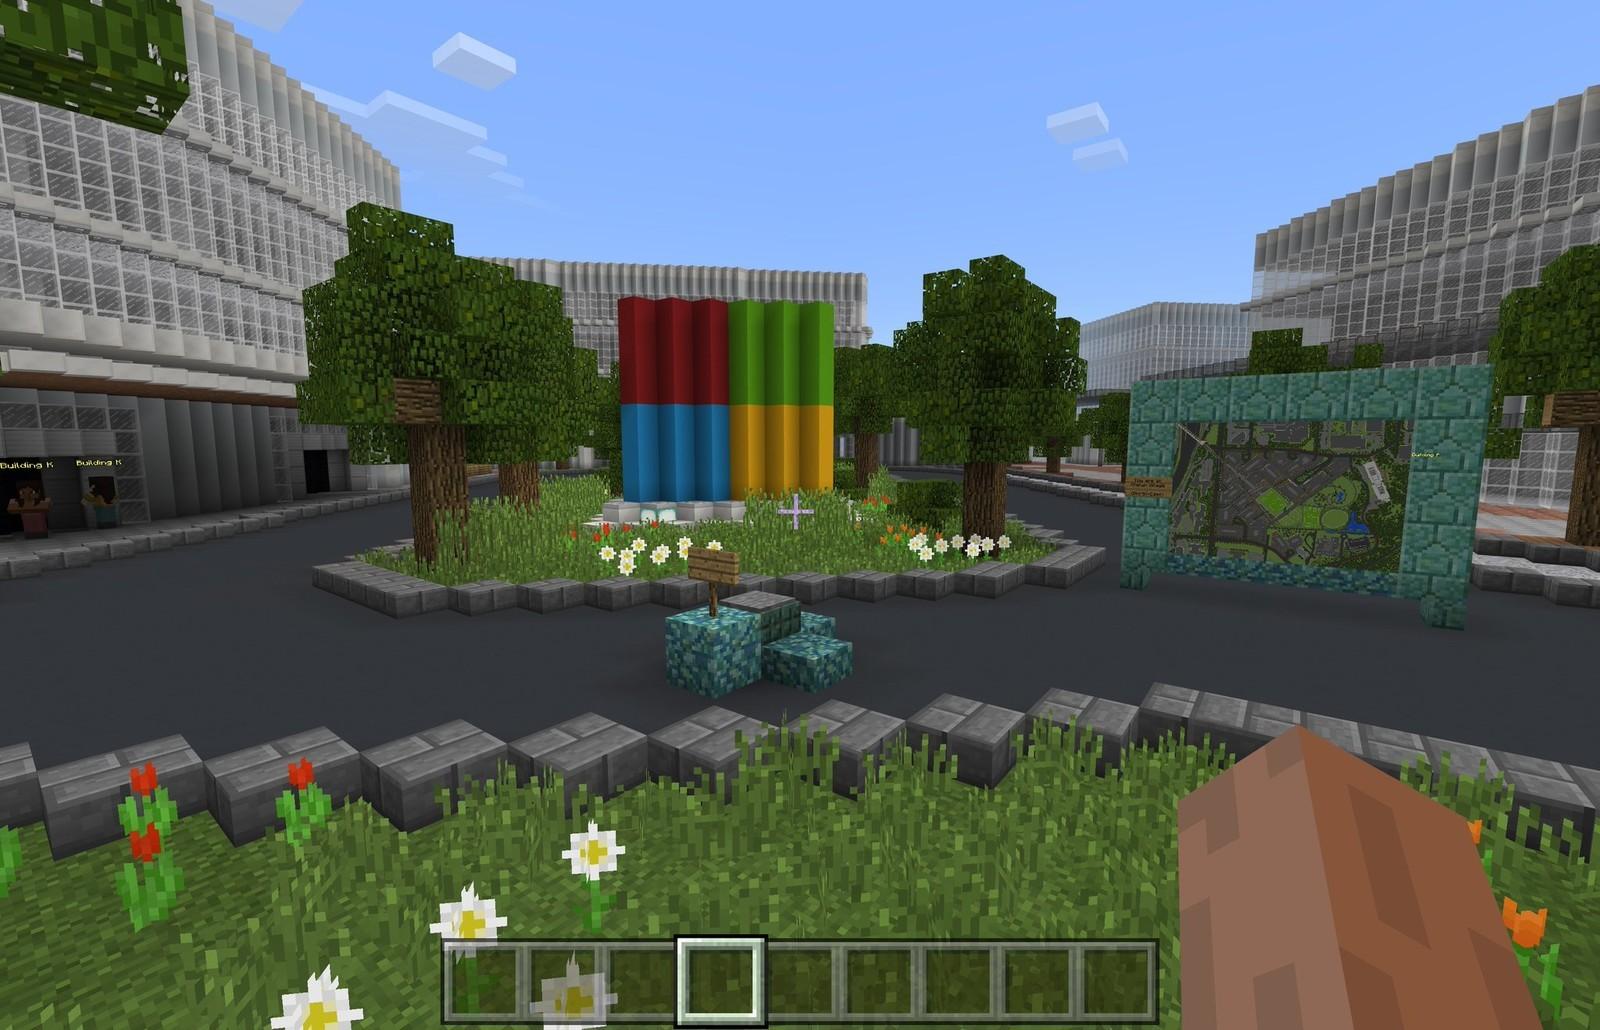 Microsoft Redmond Campus Revamp 2022